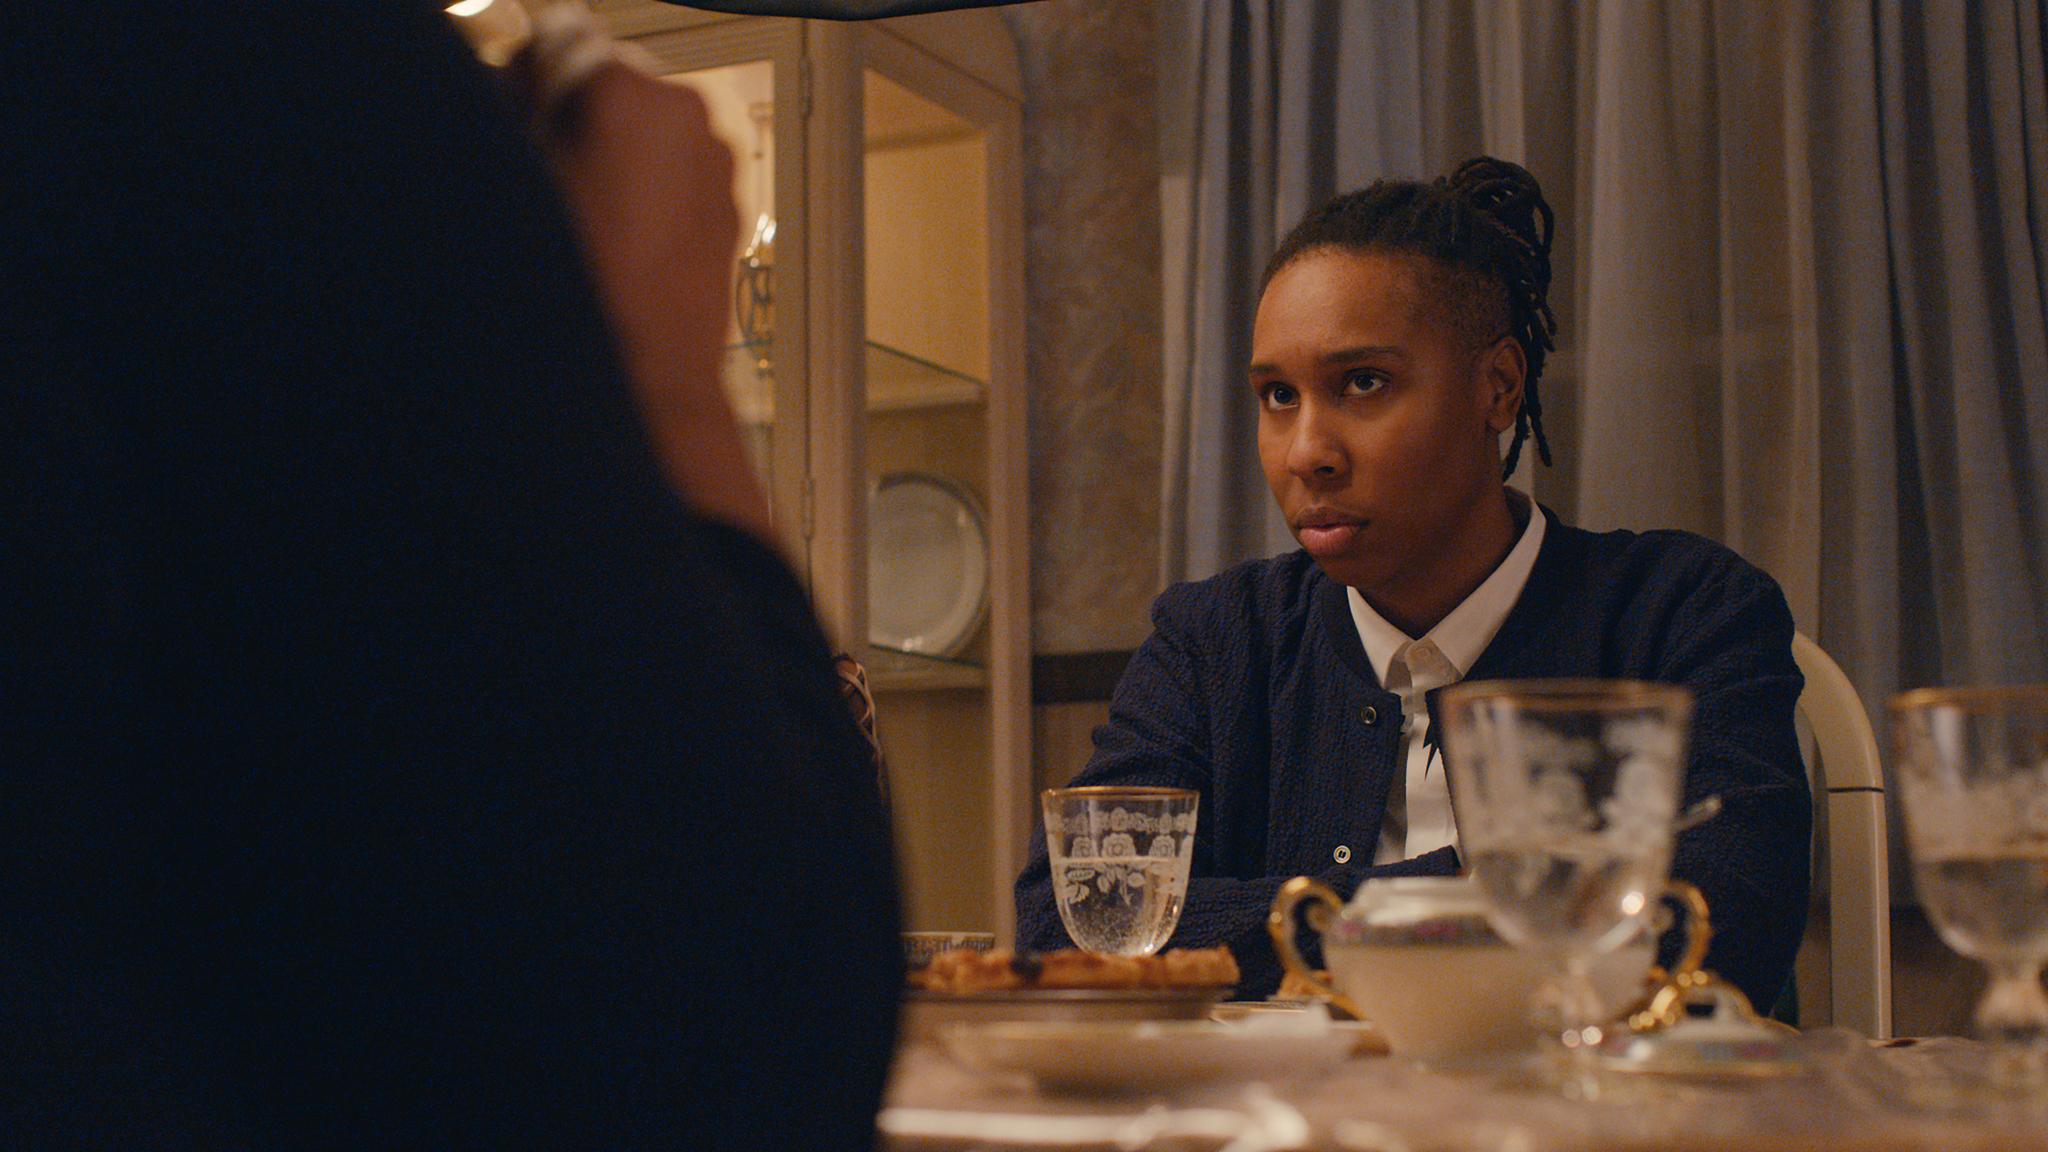 Lena Waithe in Master of None (2015)